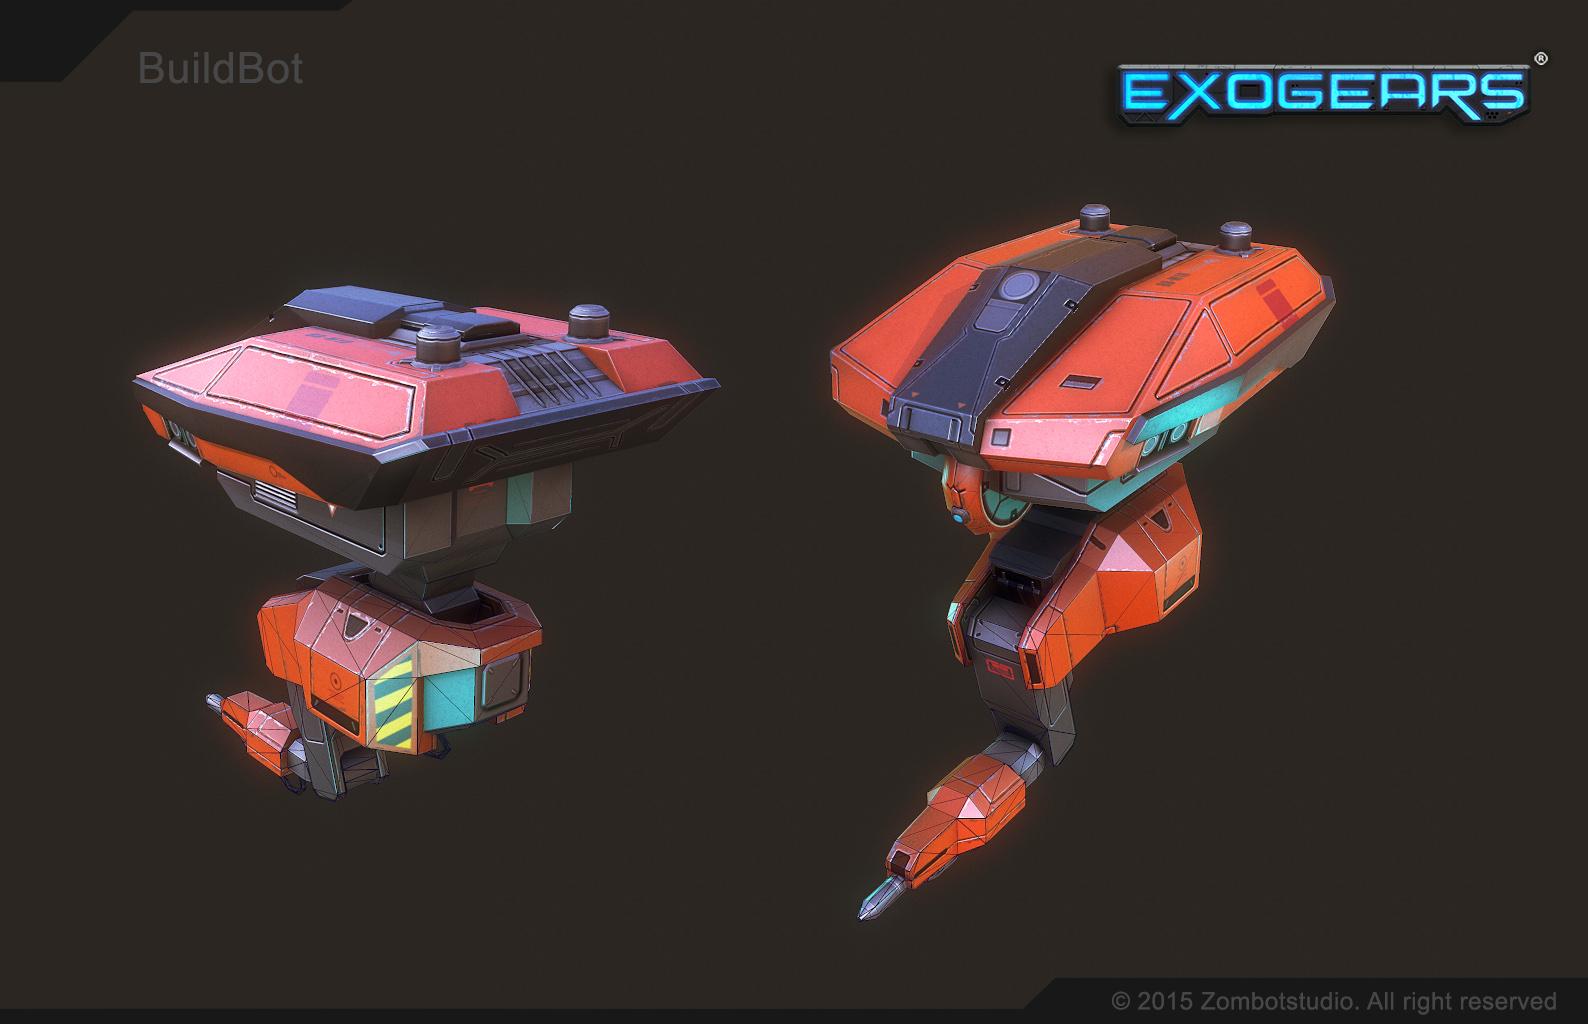 Build Bot